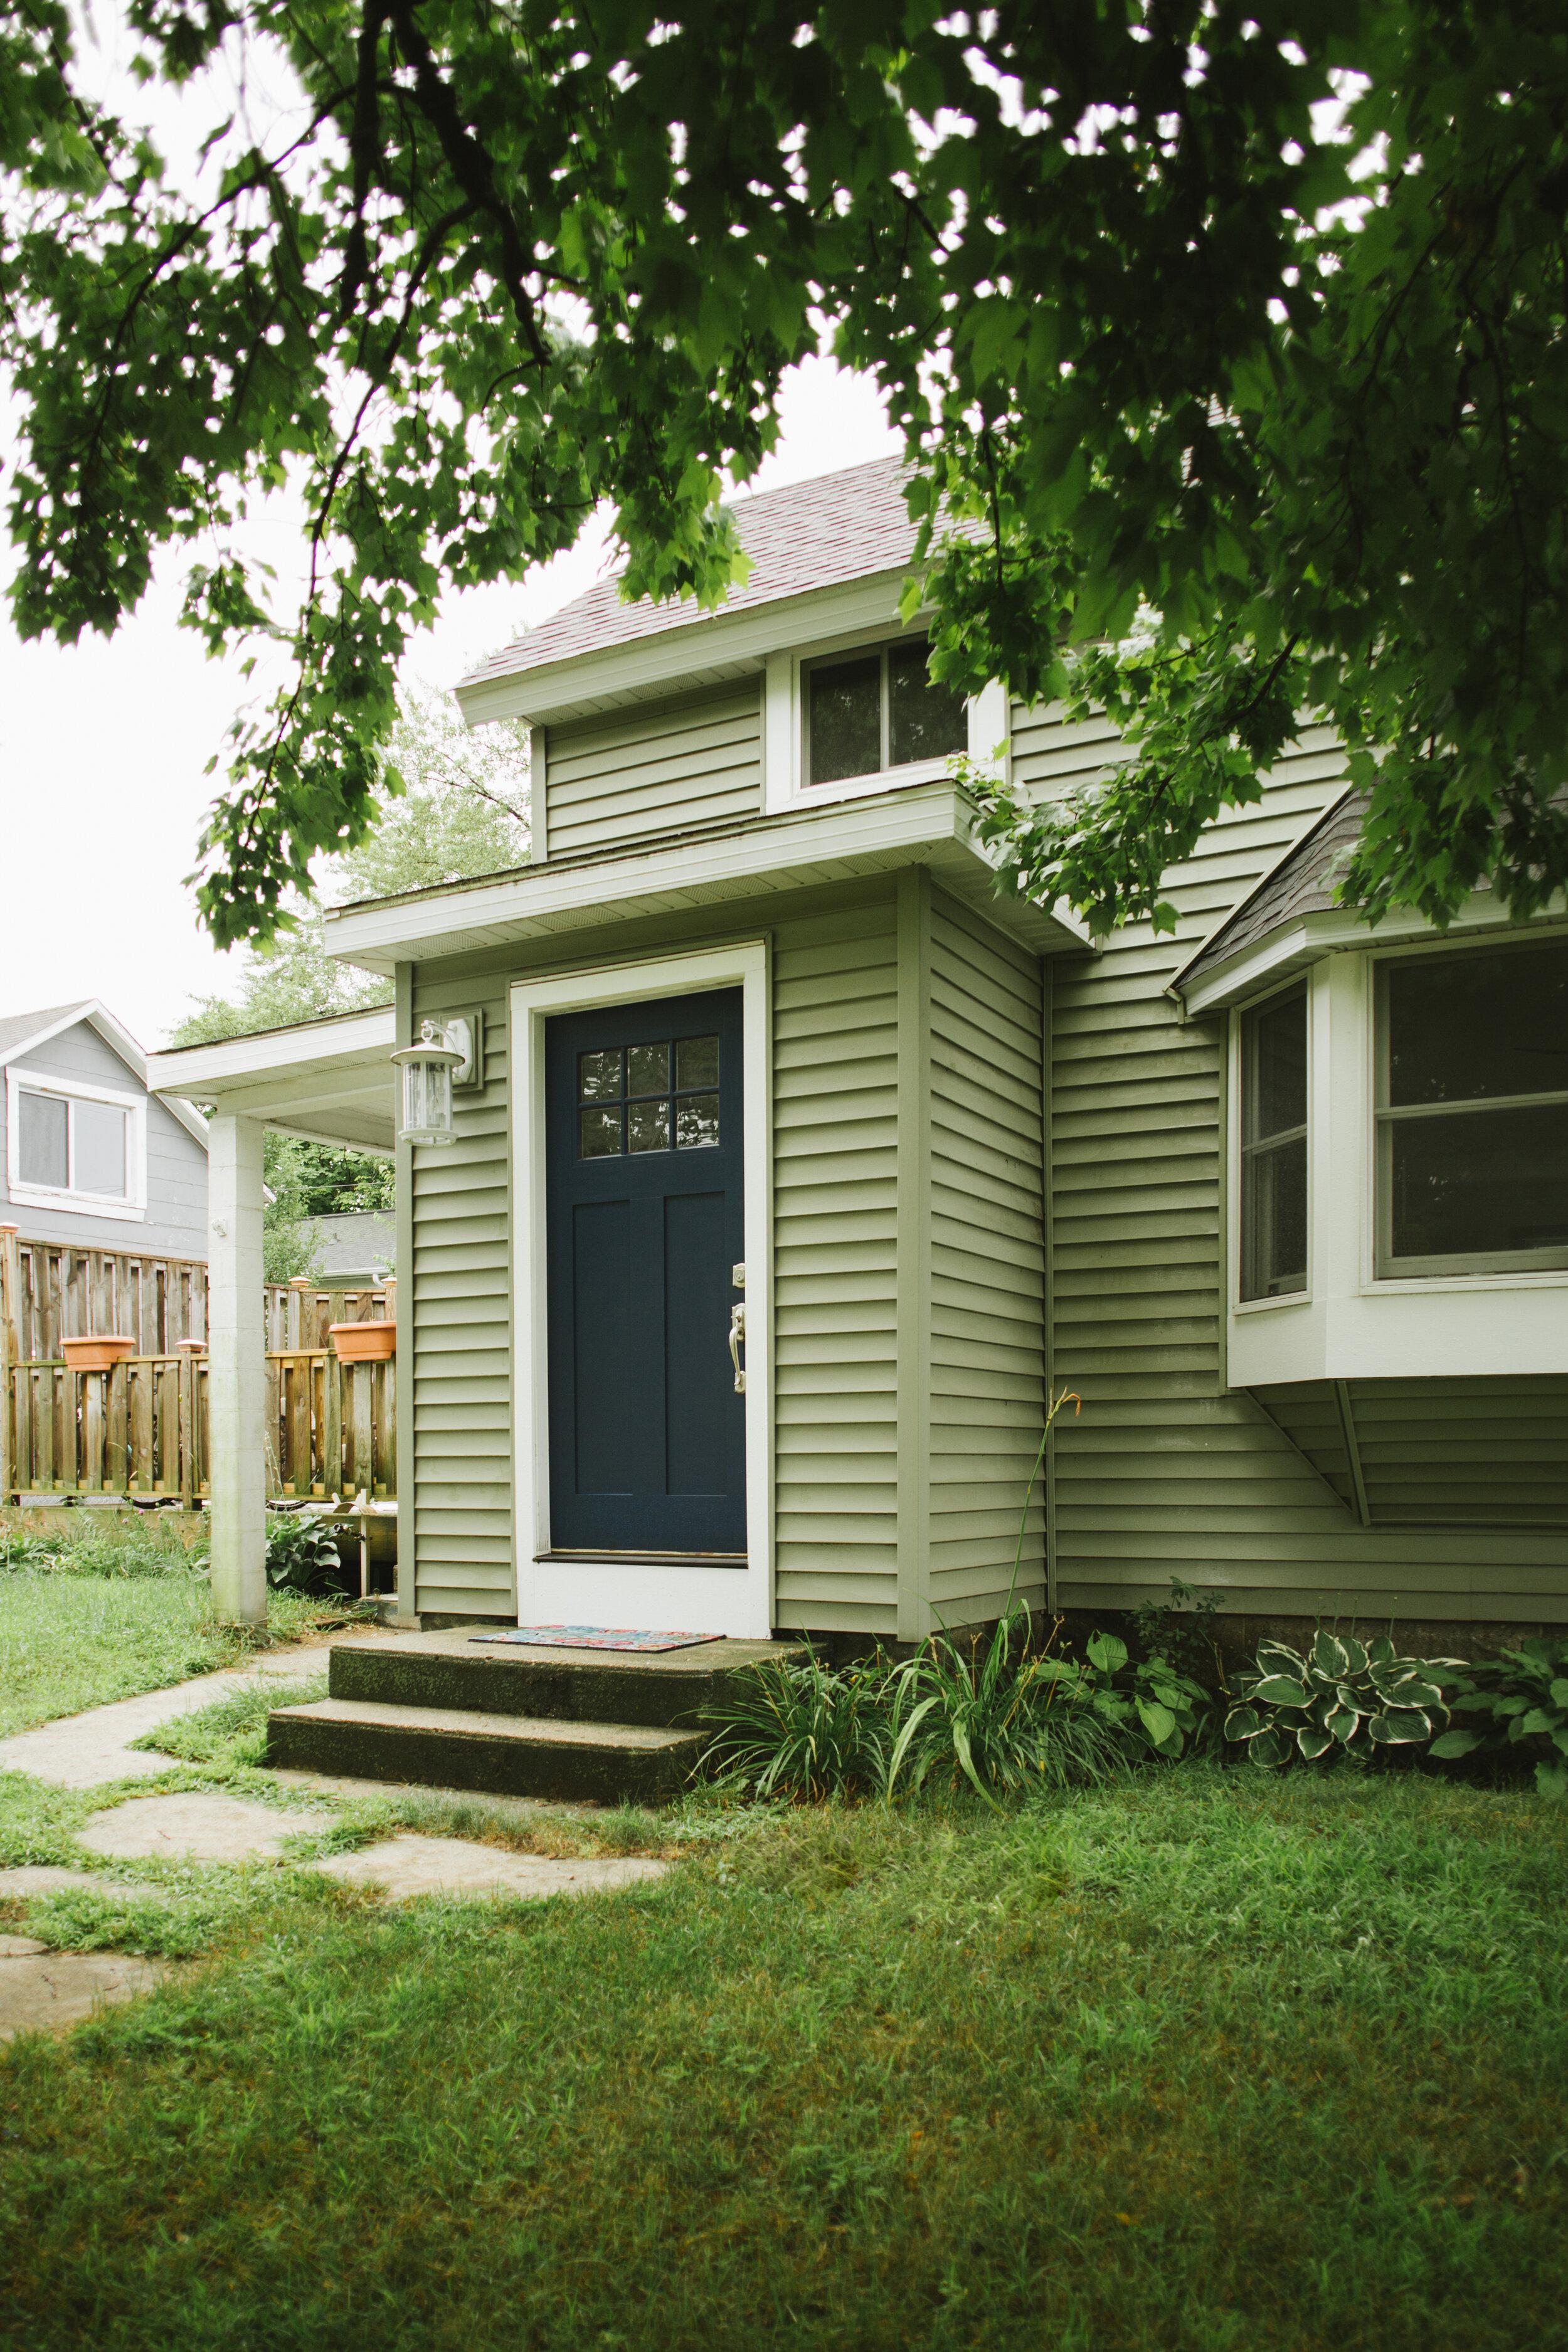 Green house with blue door